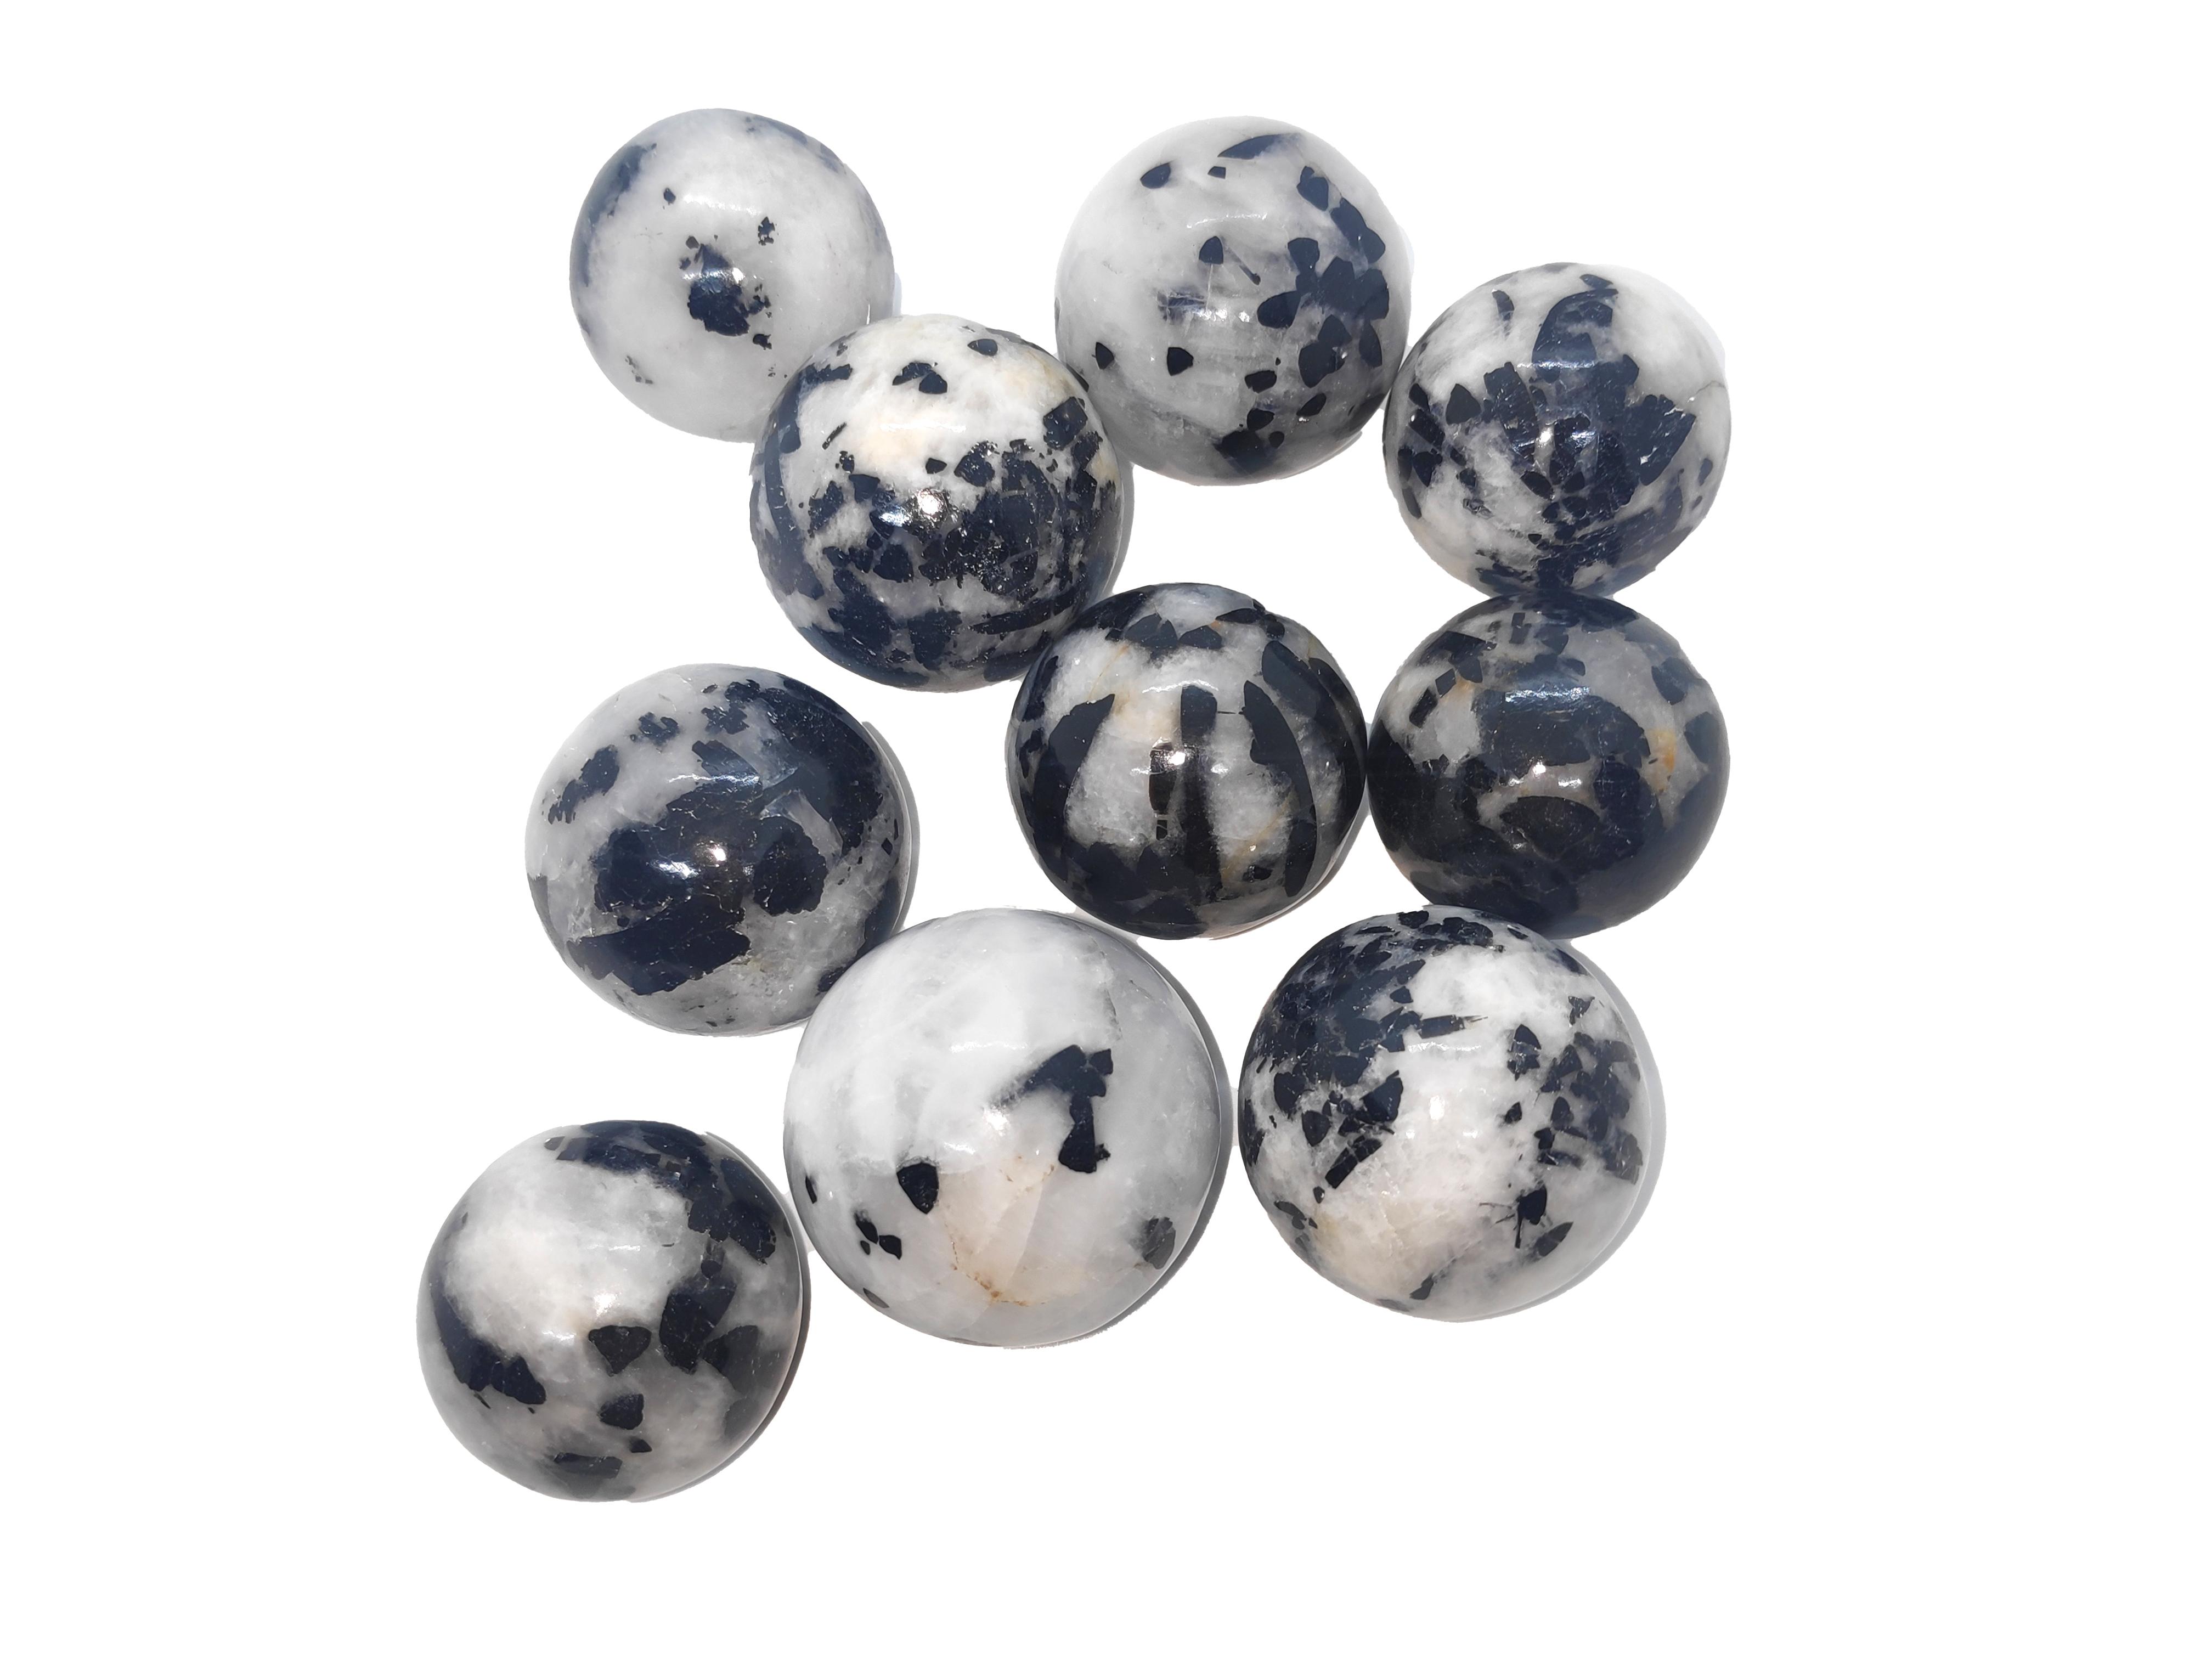 Black Tourmaline Spheres Gemstones